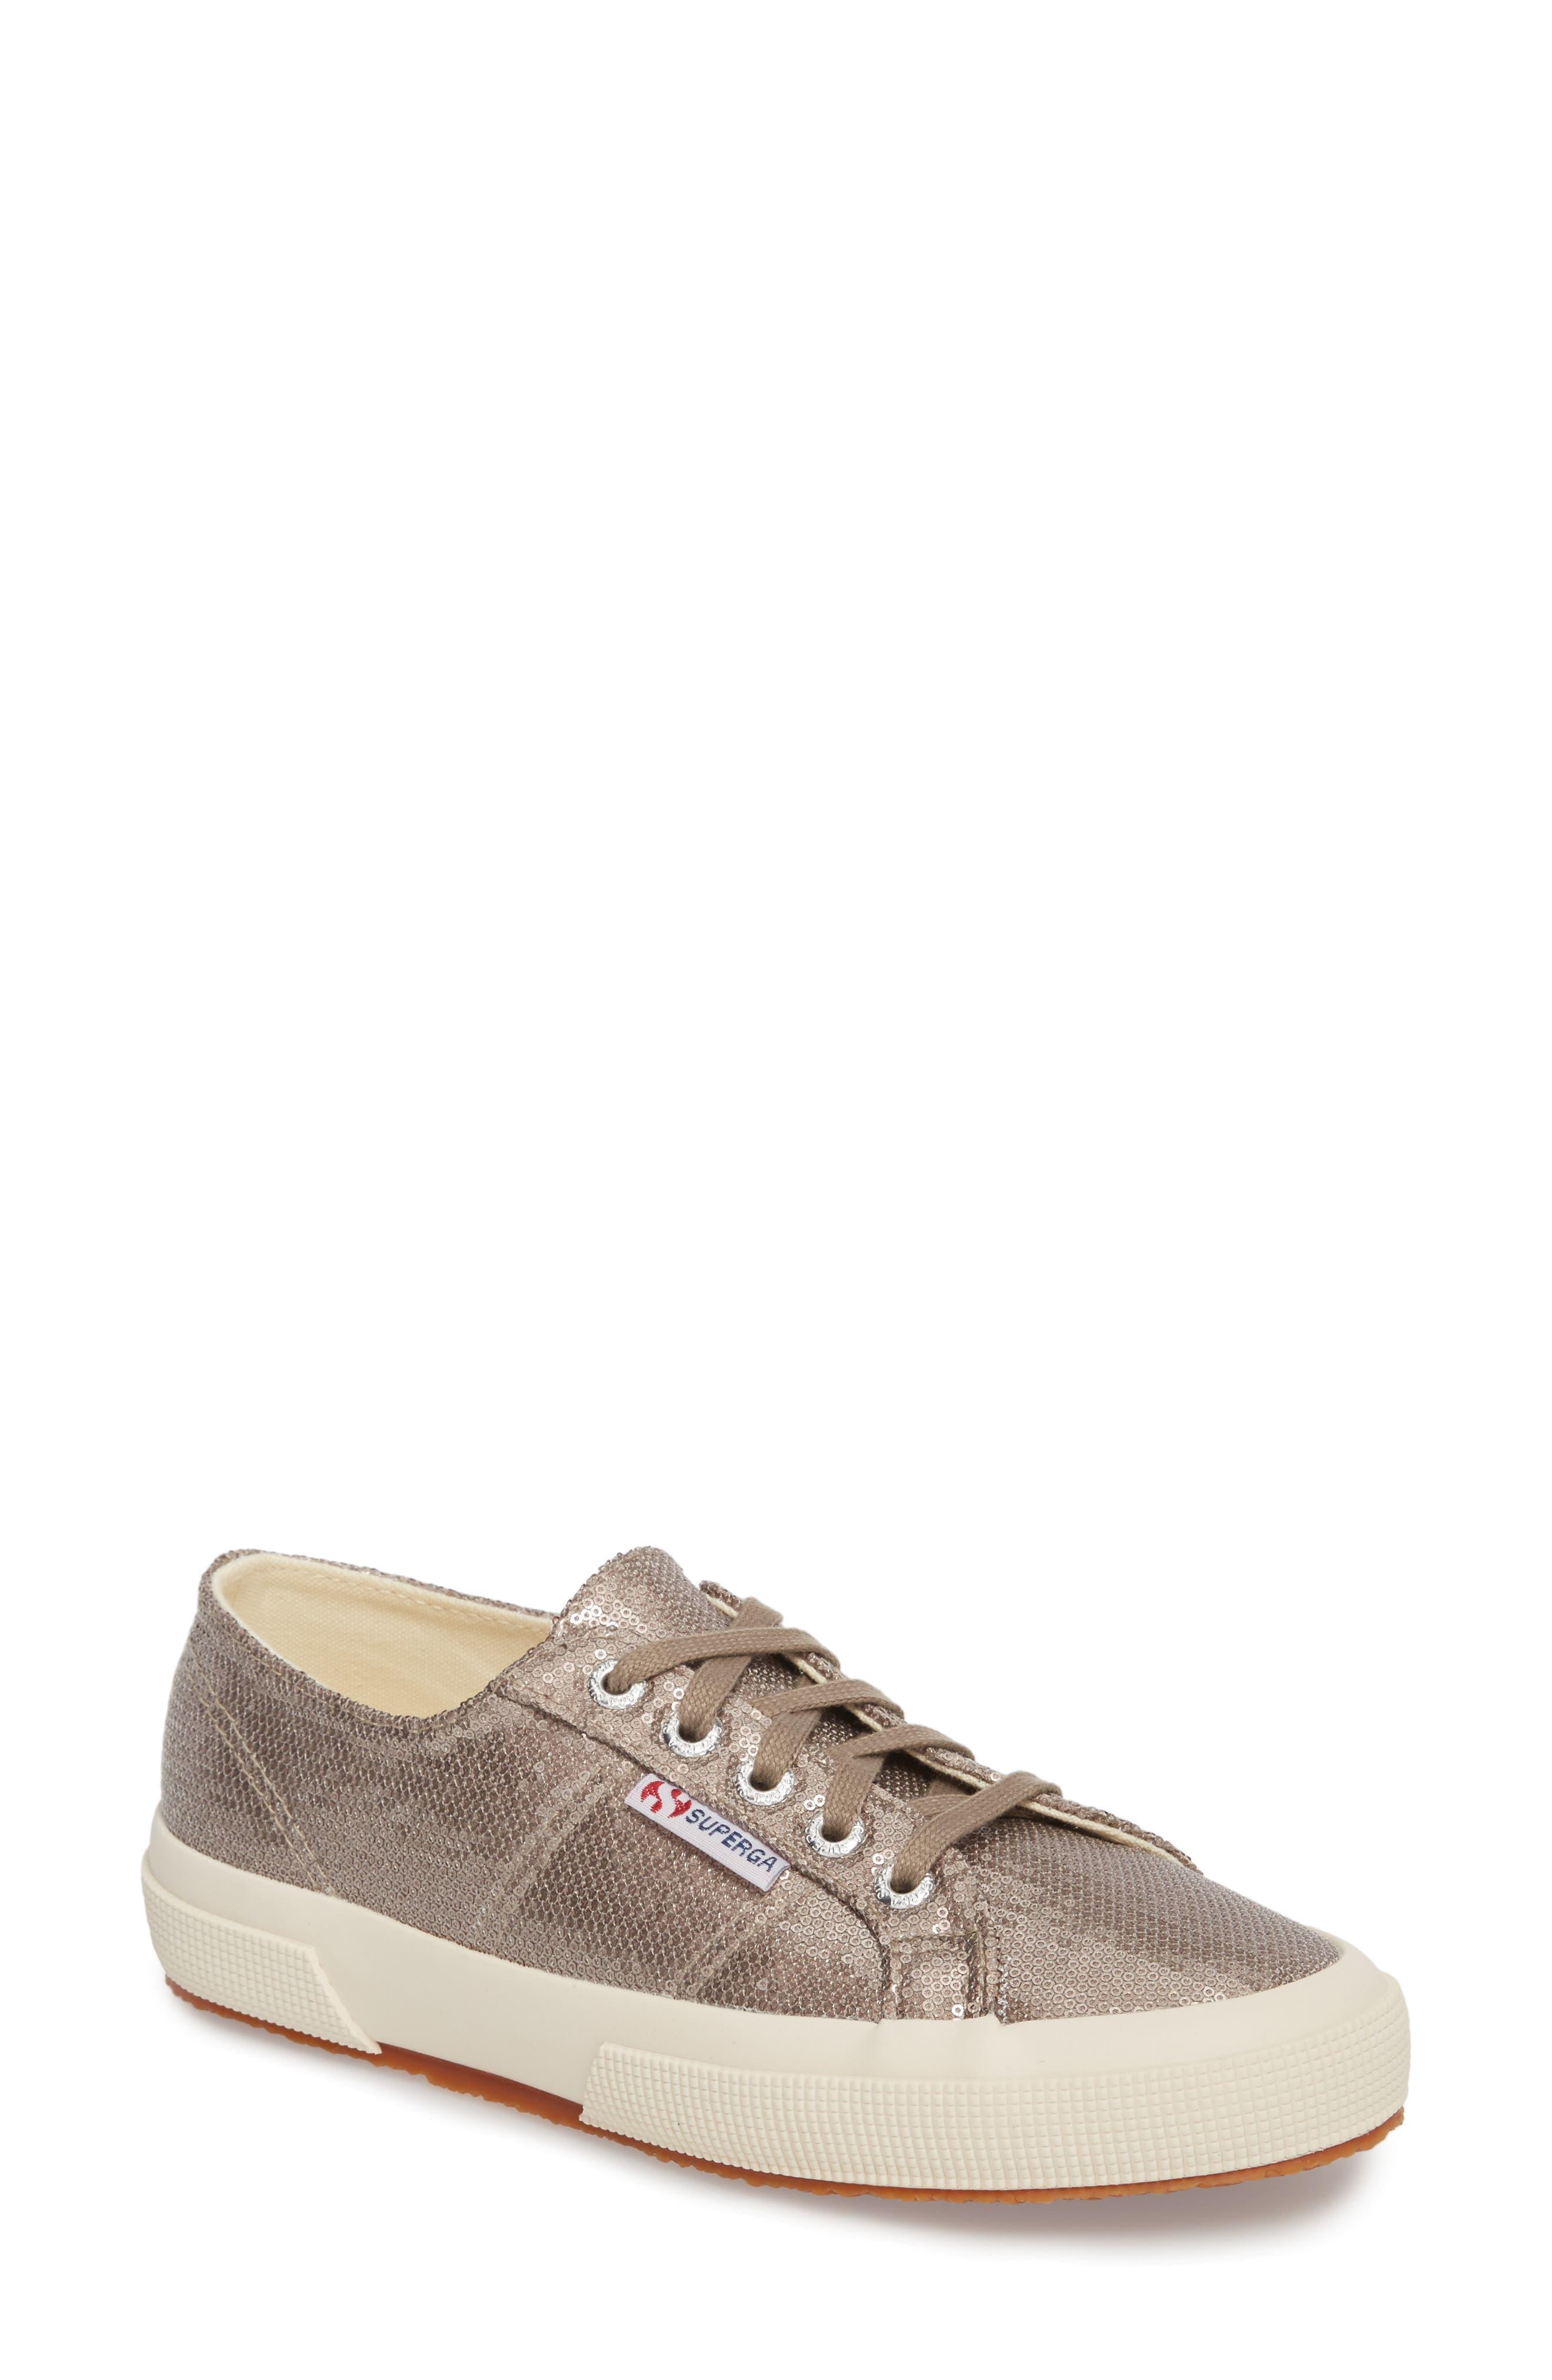 2750 Micro Sequin Sneaker,                         Main,                         color,